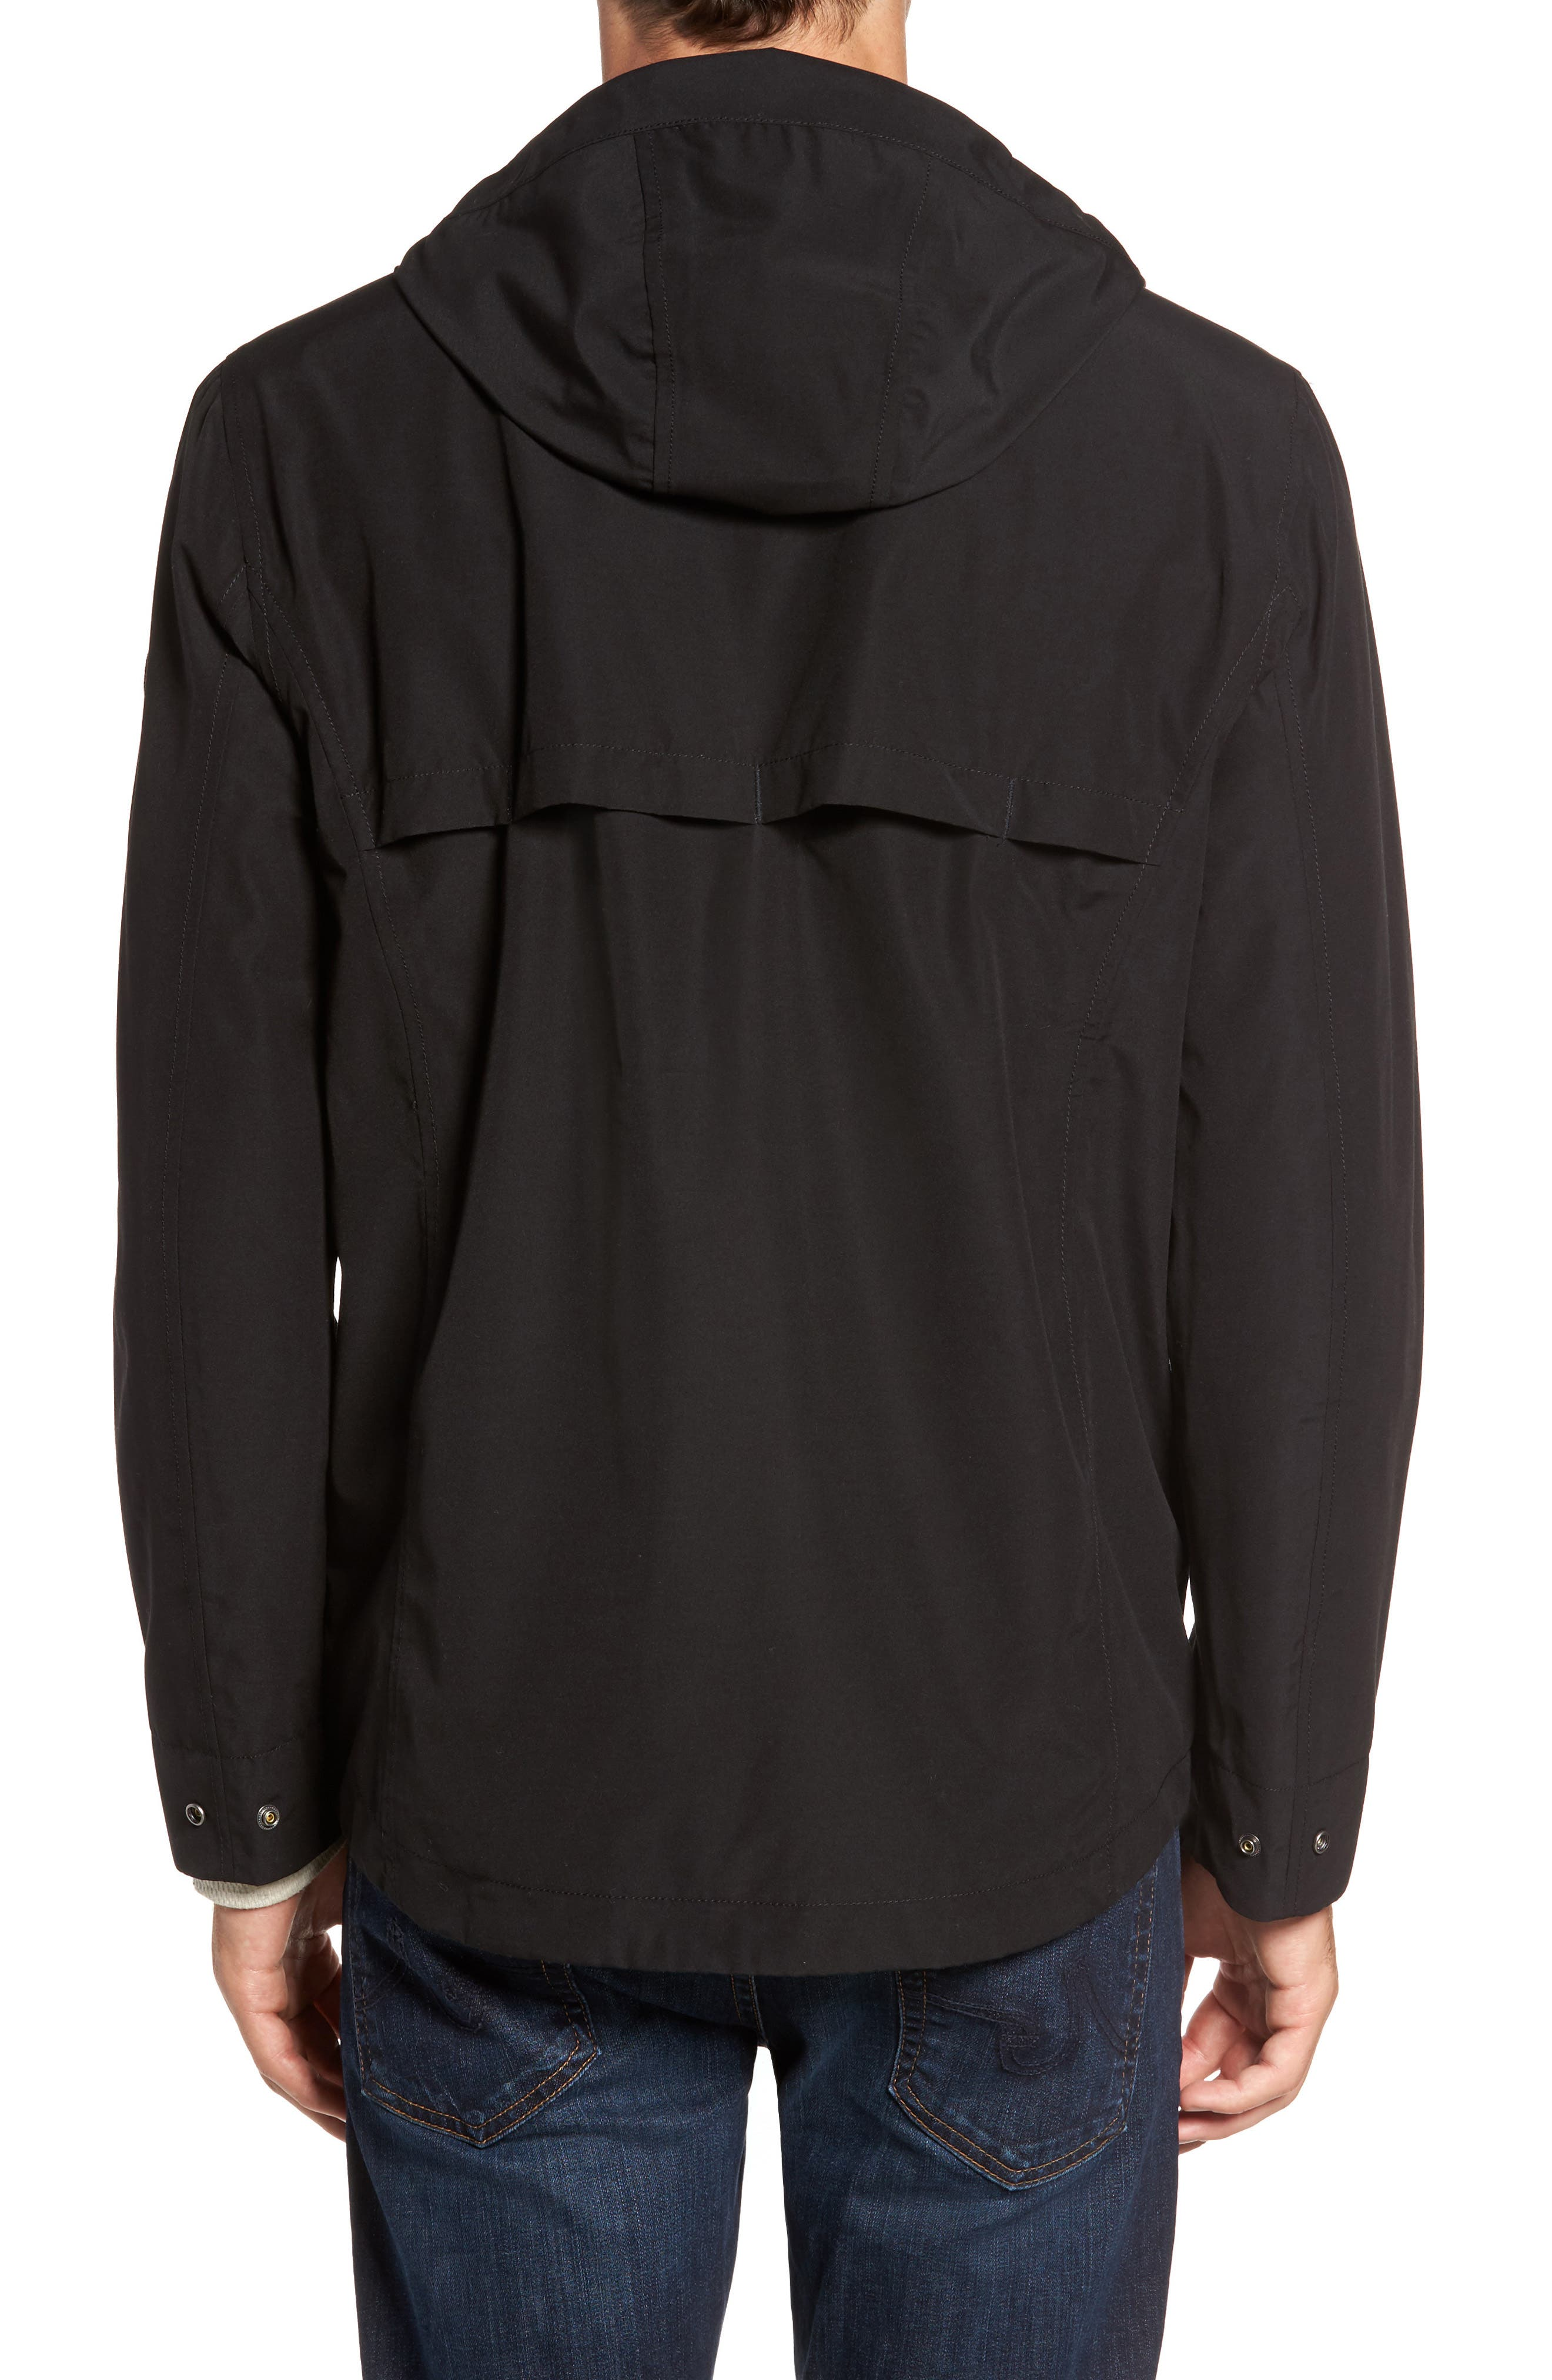 Ragged Mountain Packable Waterproof Jacket,                             Alternate thumbnail 2, color,                             Black